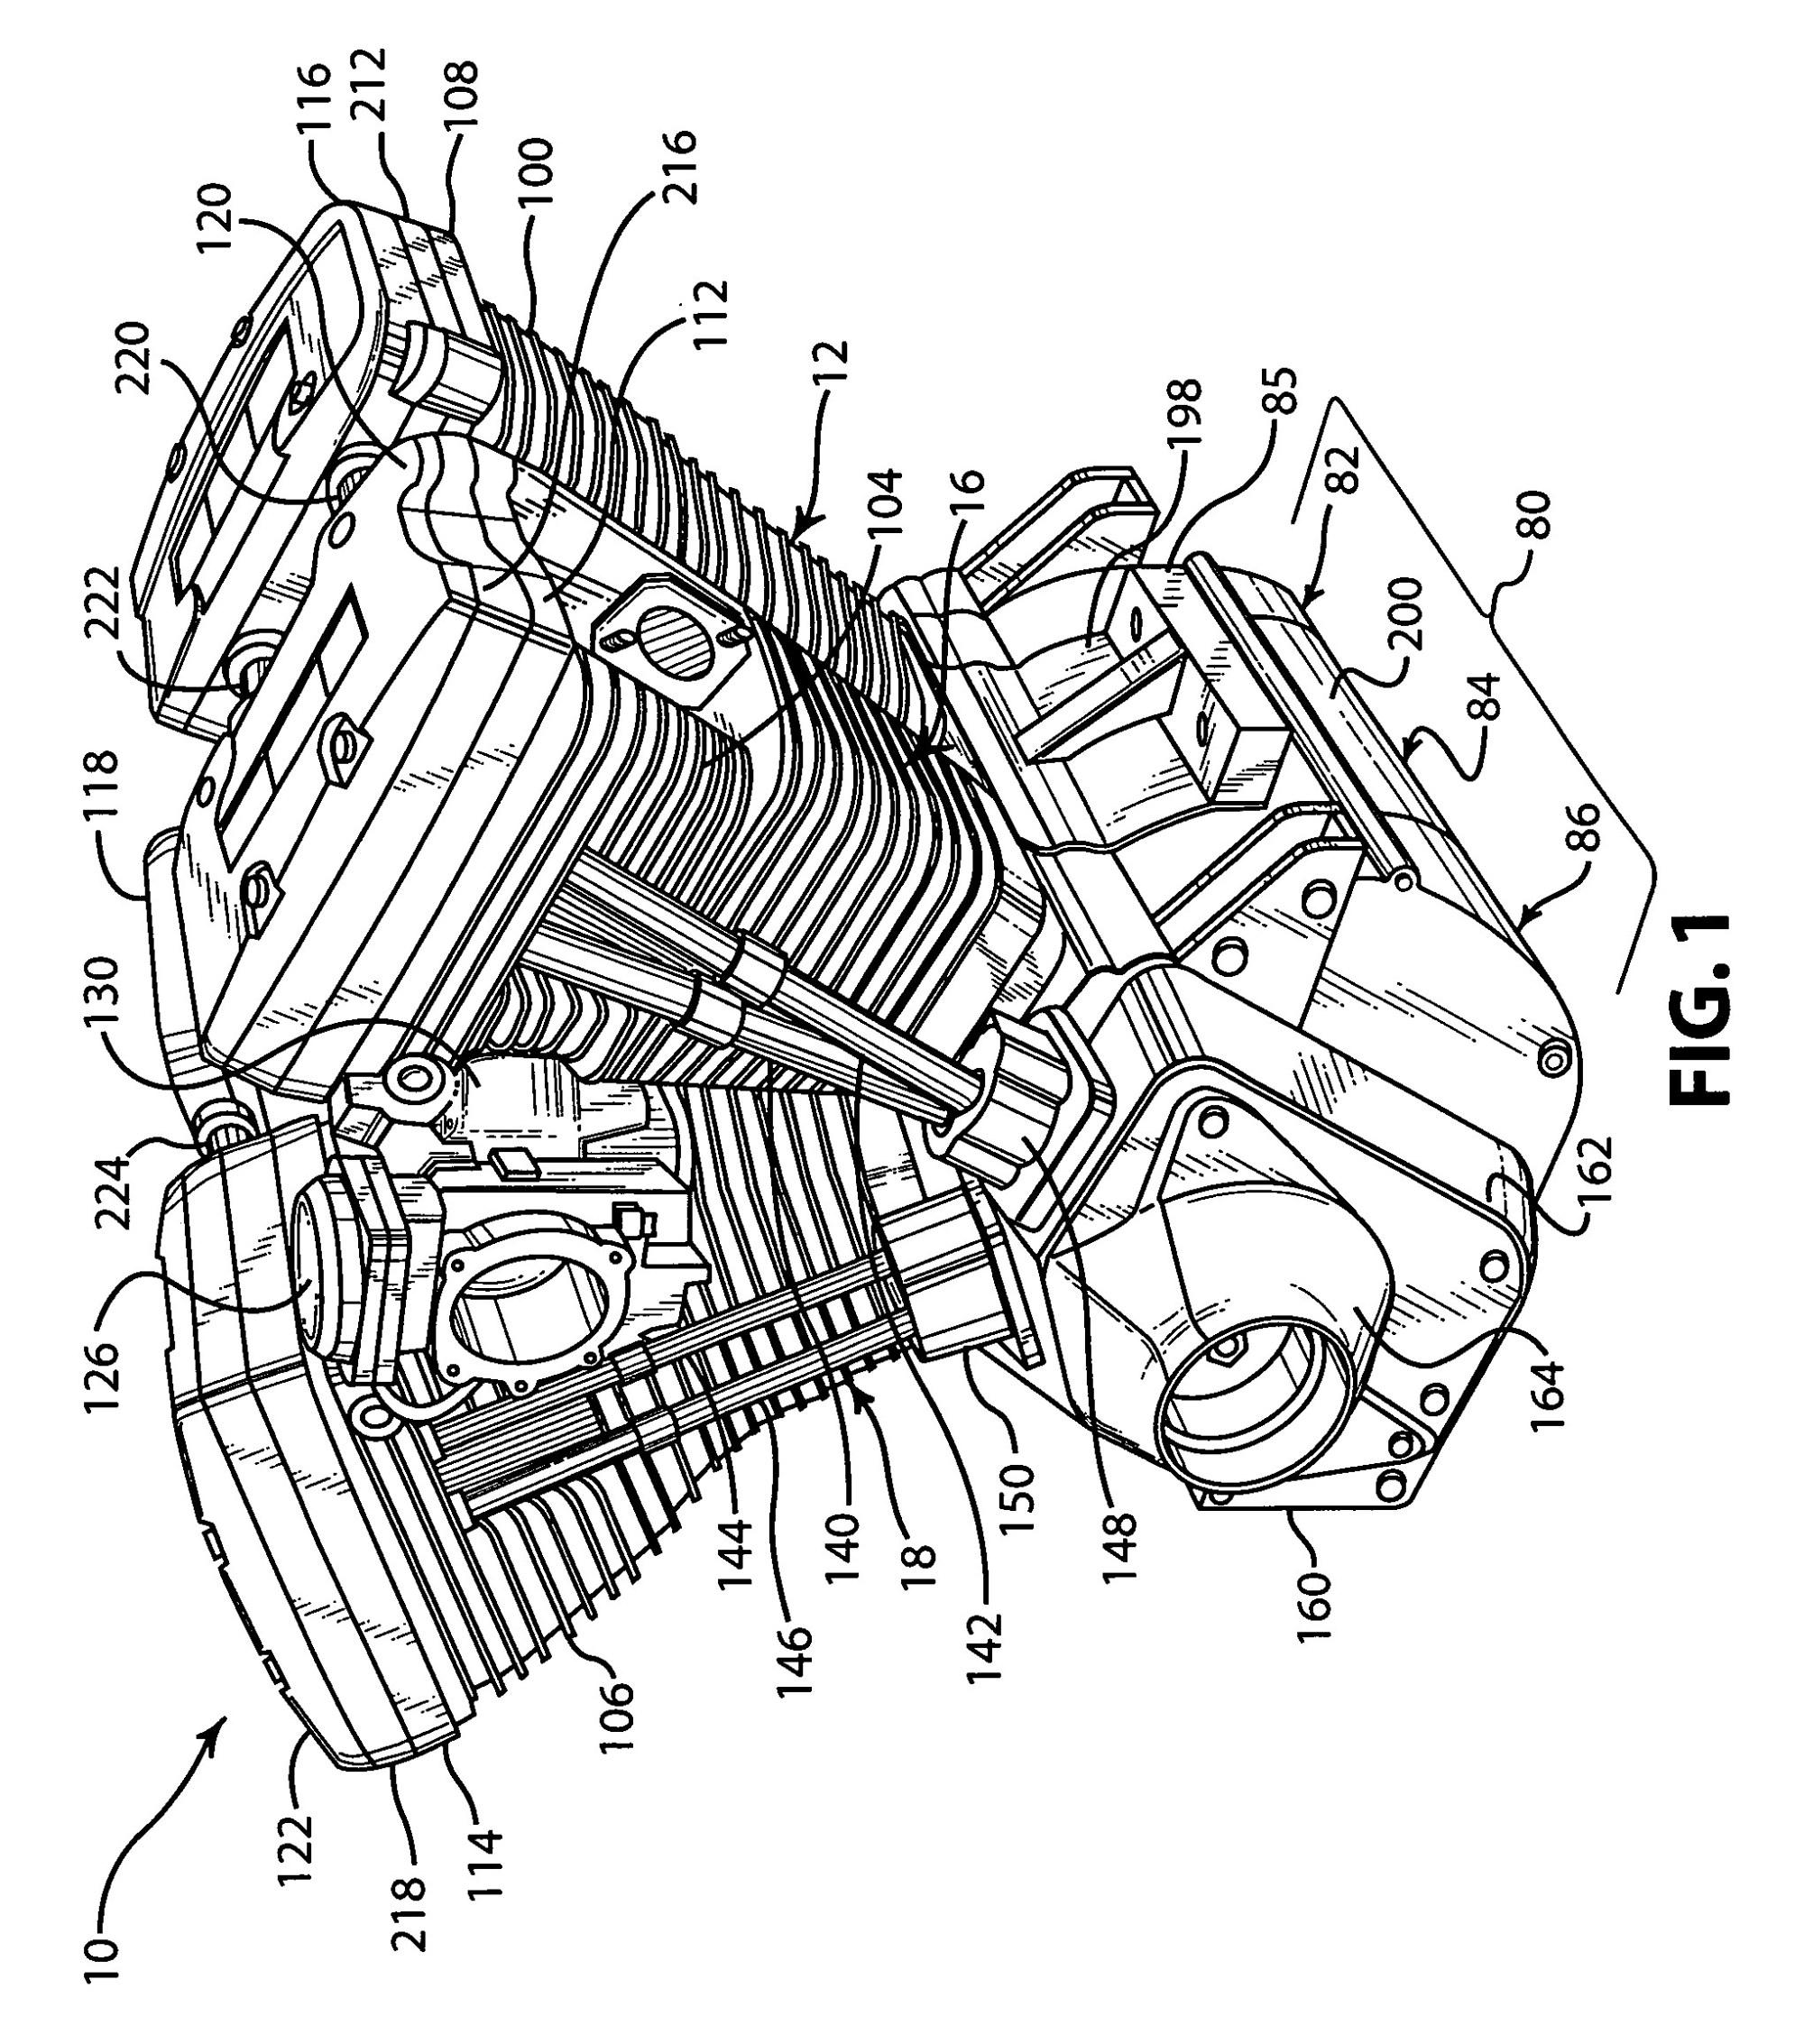 hight resolution of harley davidson parts diagram basic electronics wiring diagram harley 1999 flh engine diagram harley davidson engine